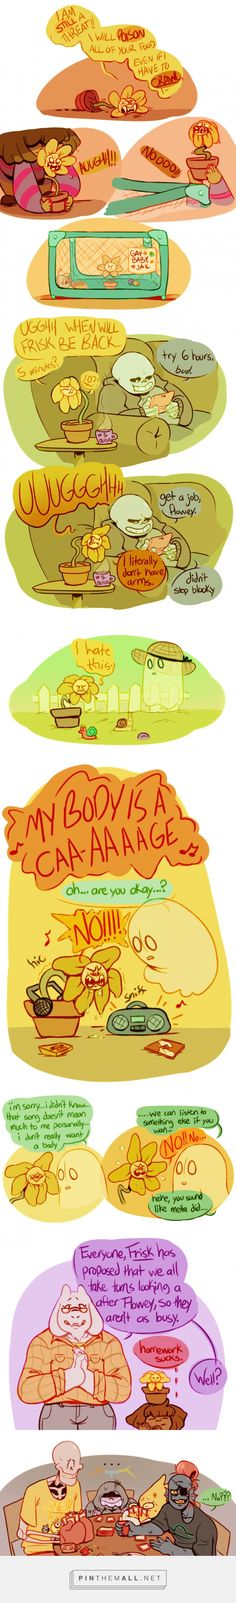 Flowery - comic